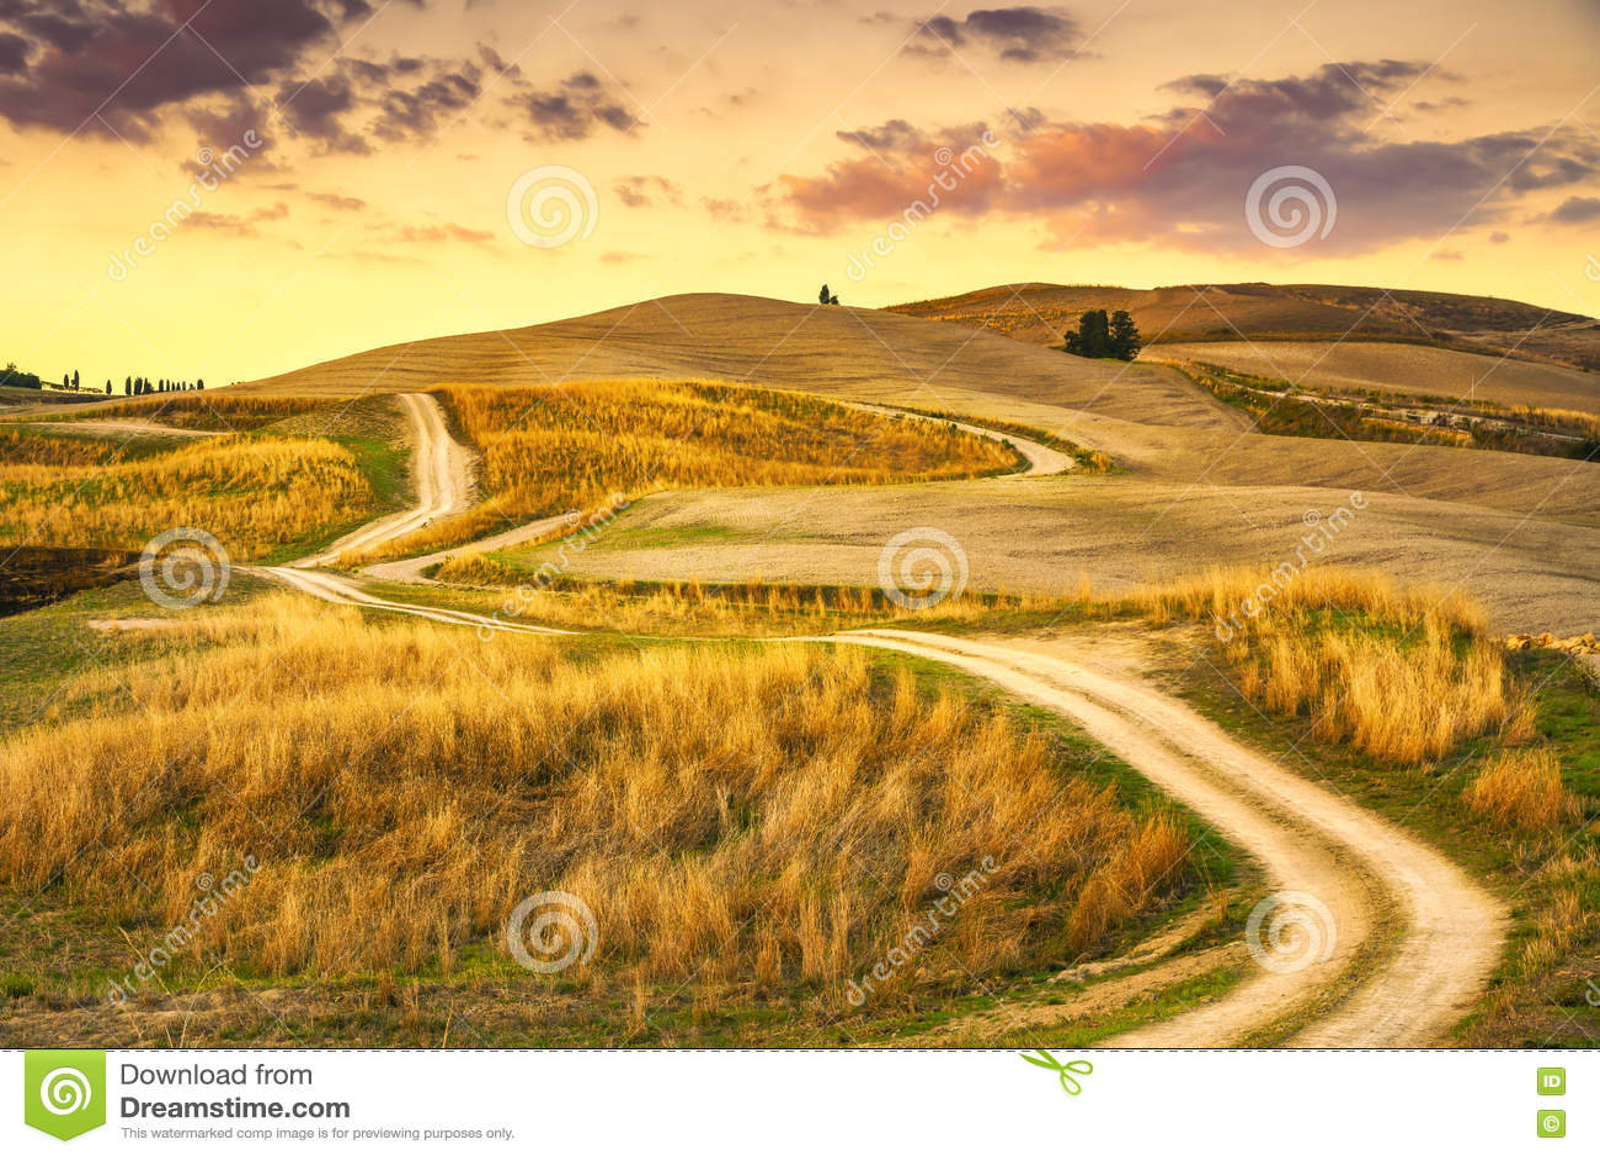 Paisagem de Toscânia, estrada rural e campo verde Volterra Italy